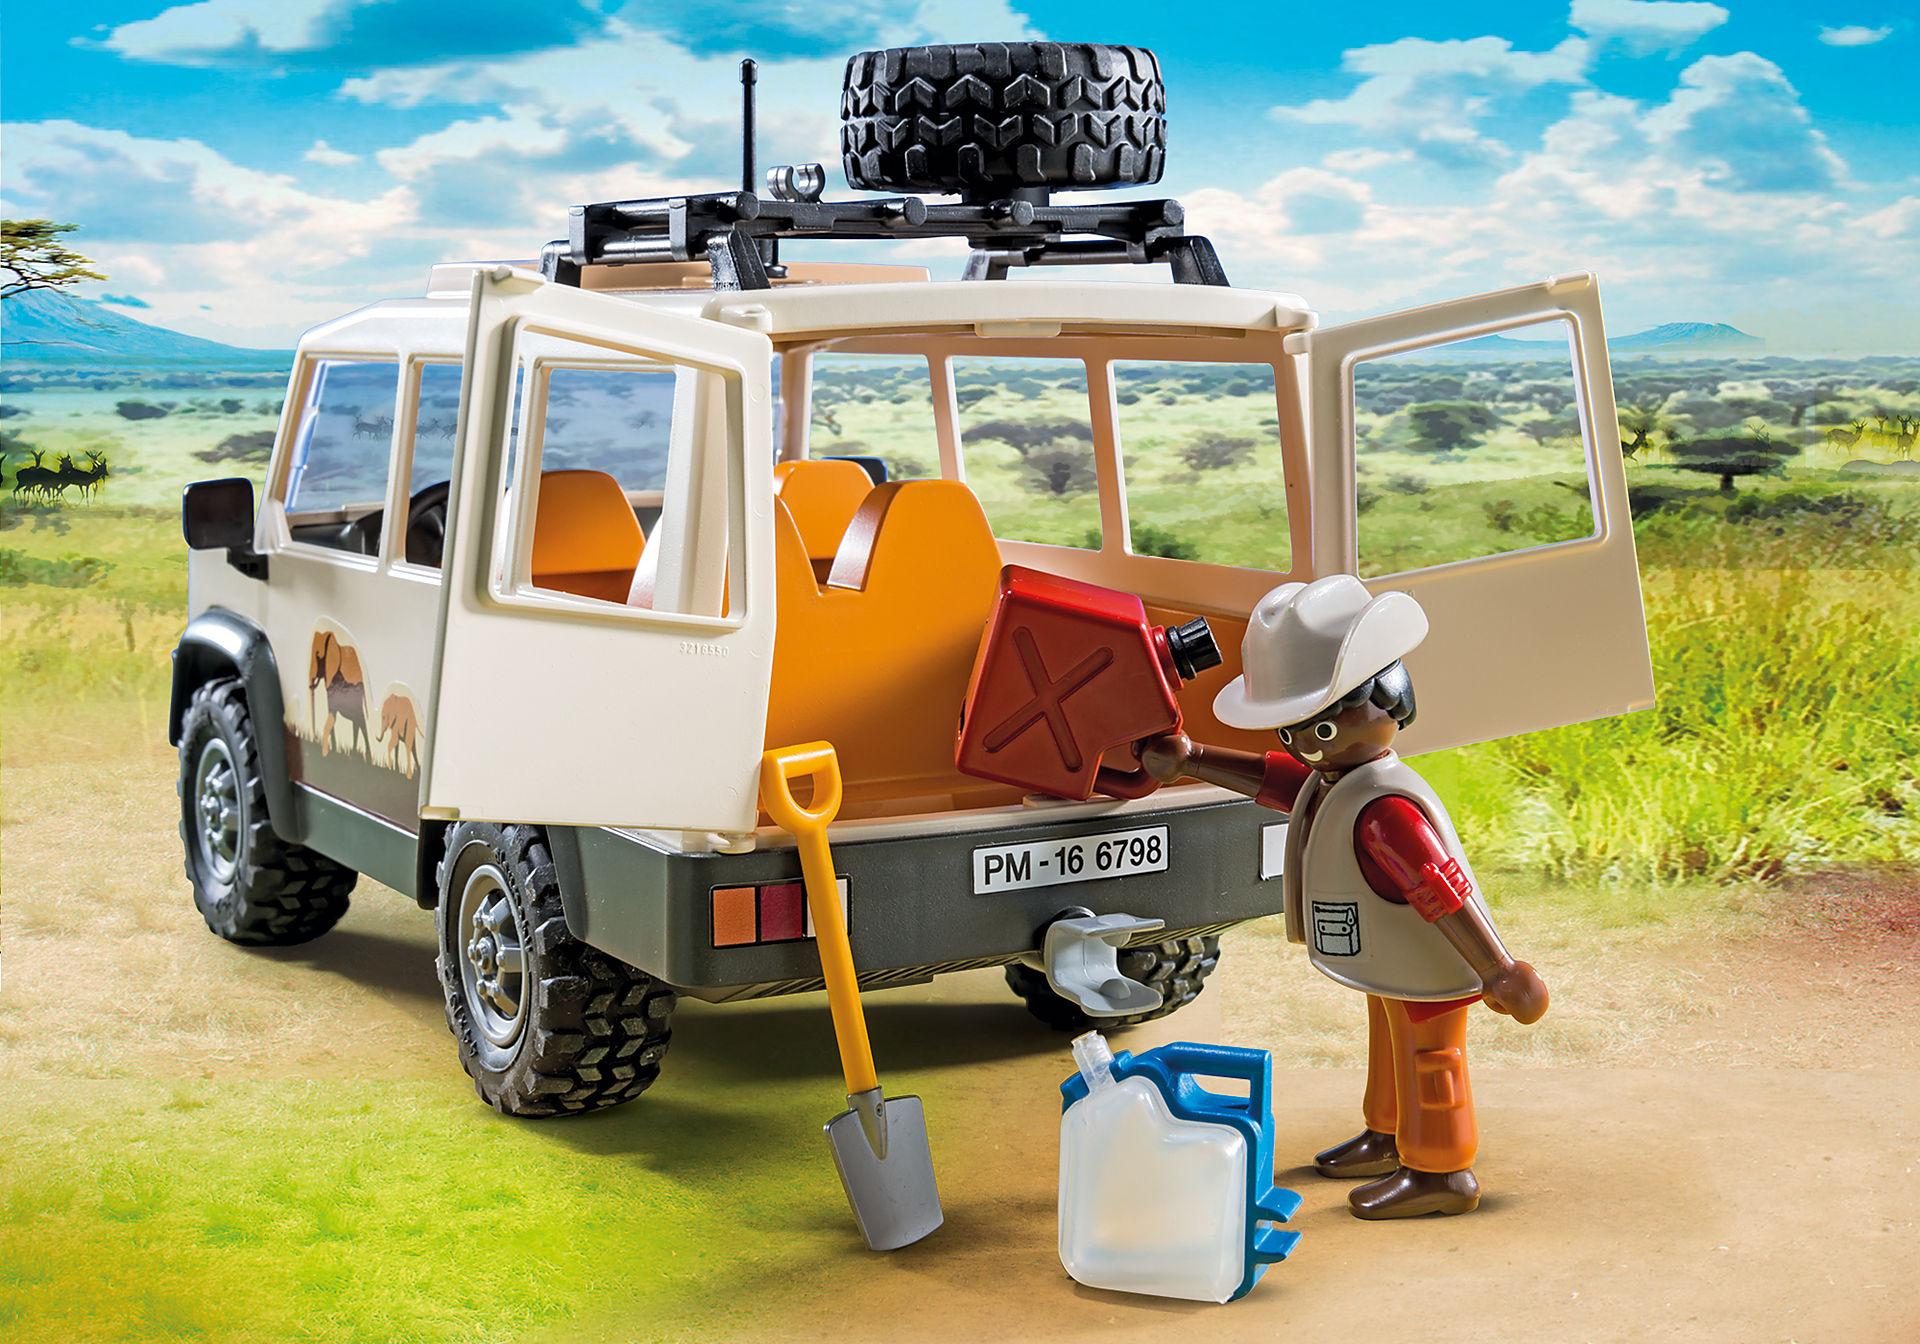 http://media.playmobil.com/i/playmobil/6798_product_extra2/Safari 4x4 met lier